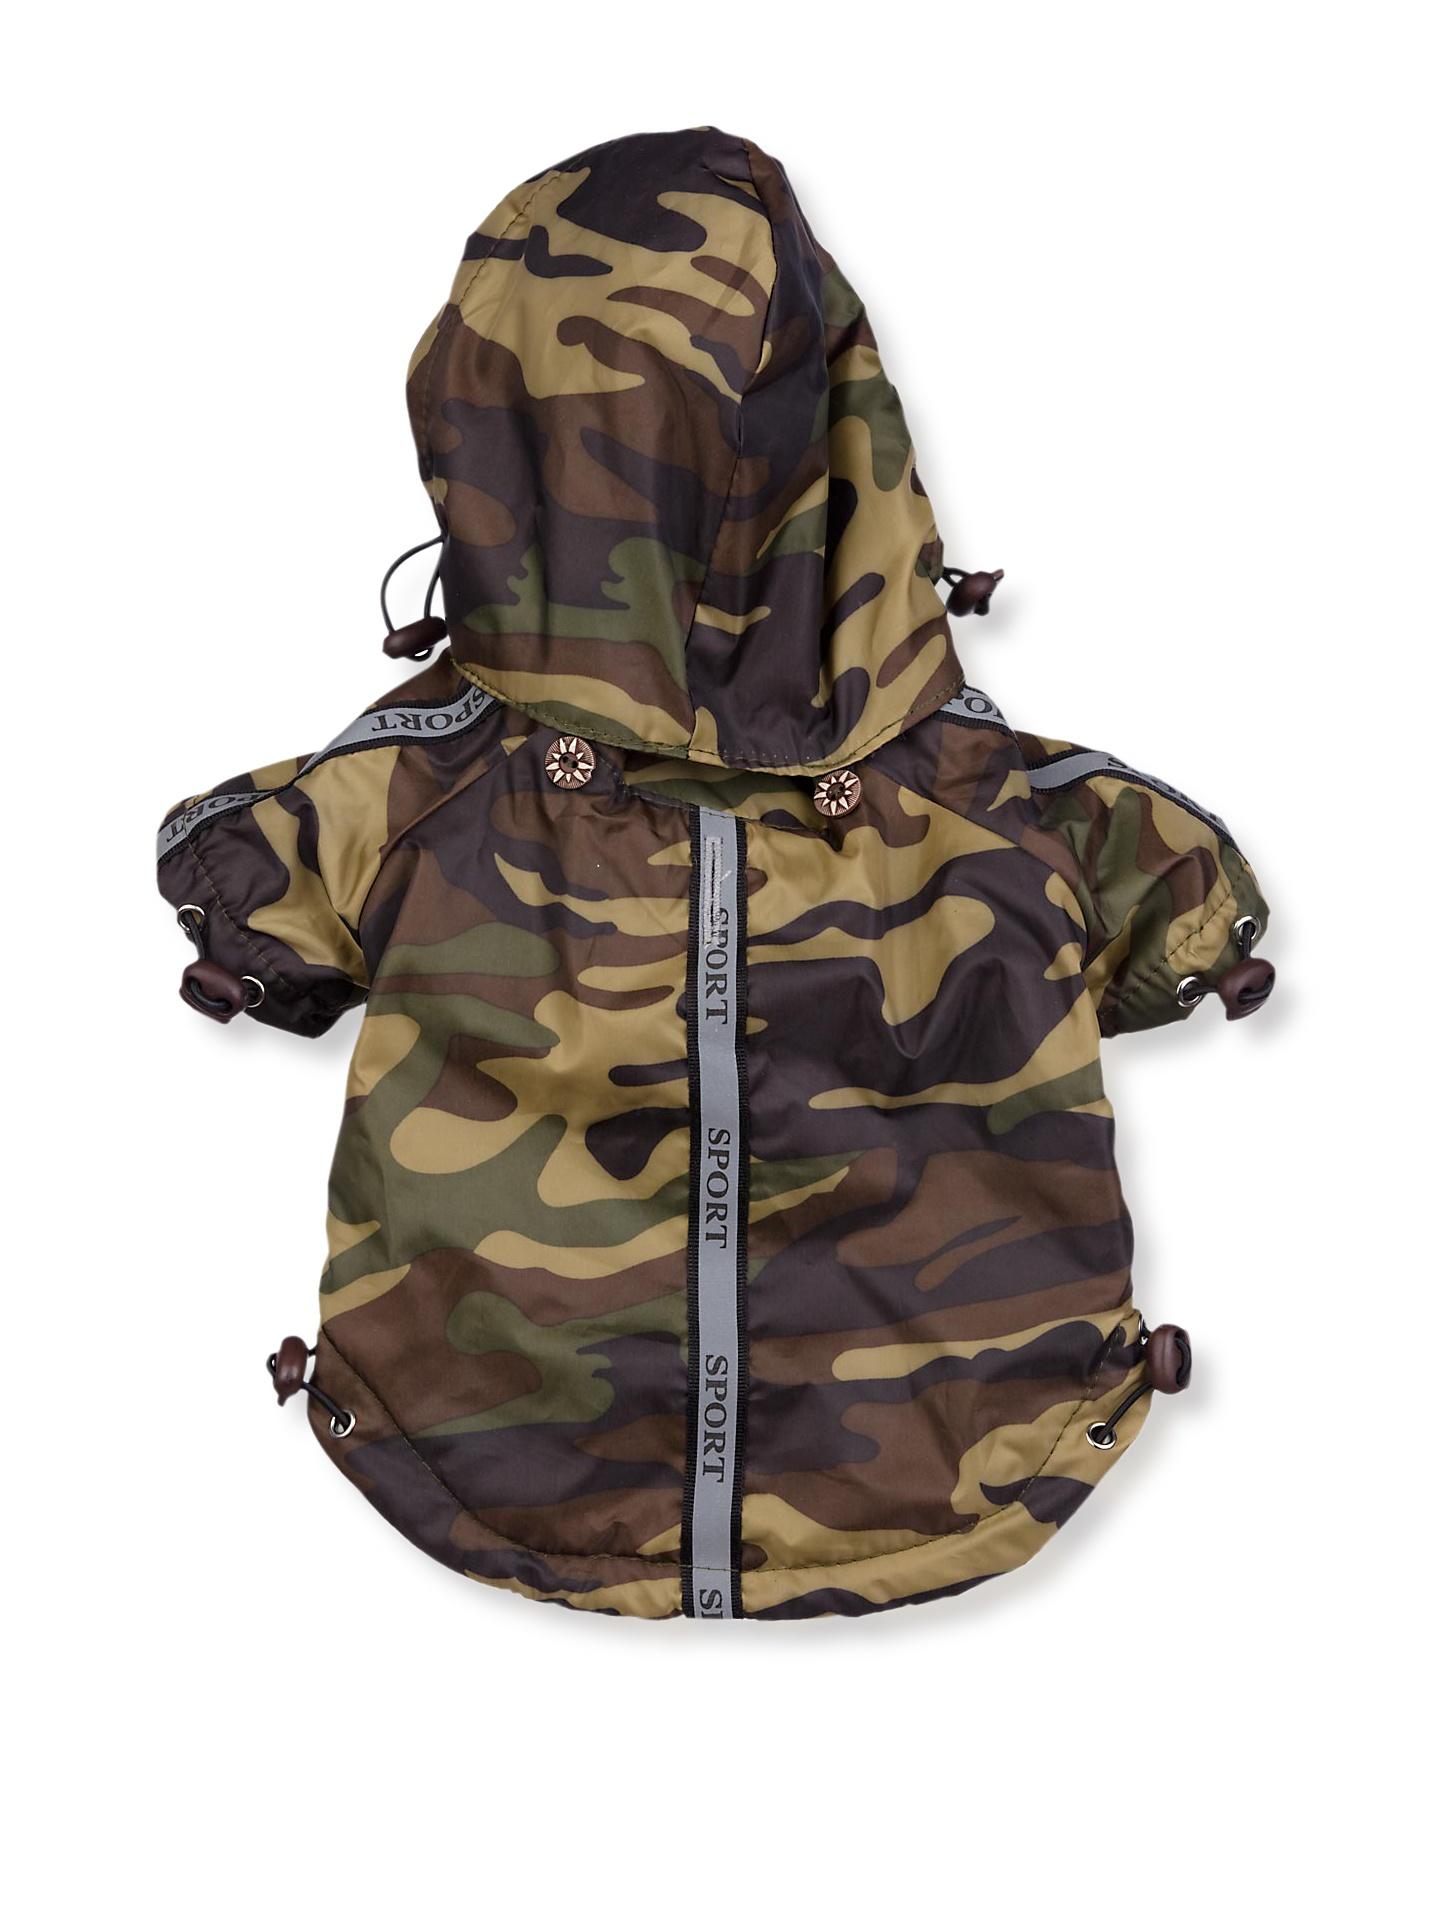 Pet Life Reflecta-Sport Rain Jacket and Windbreaker (Camouflage)